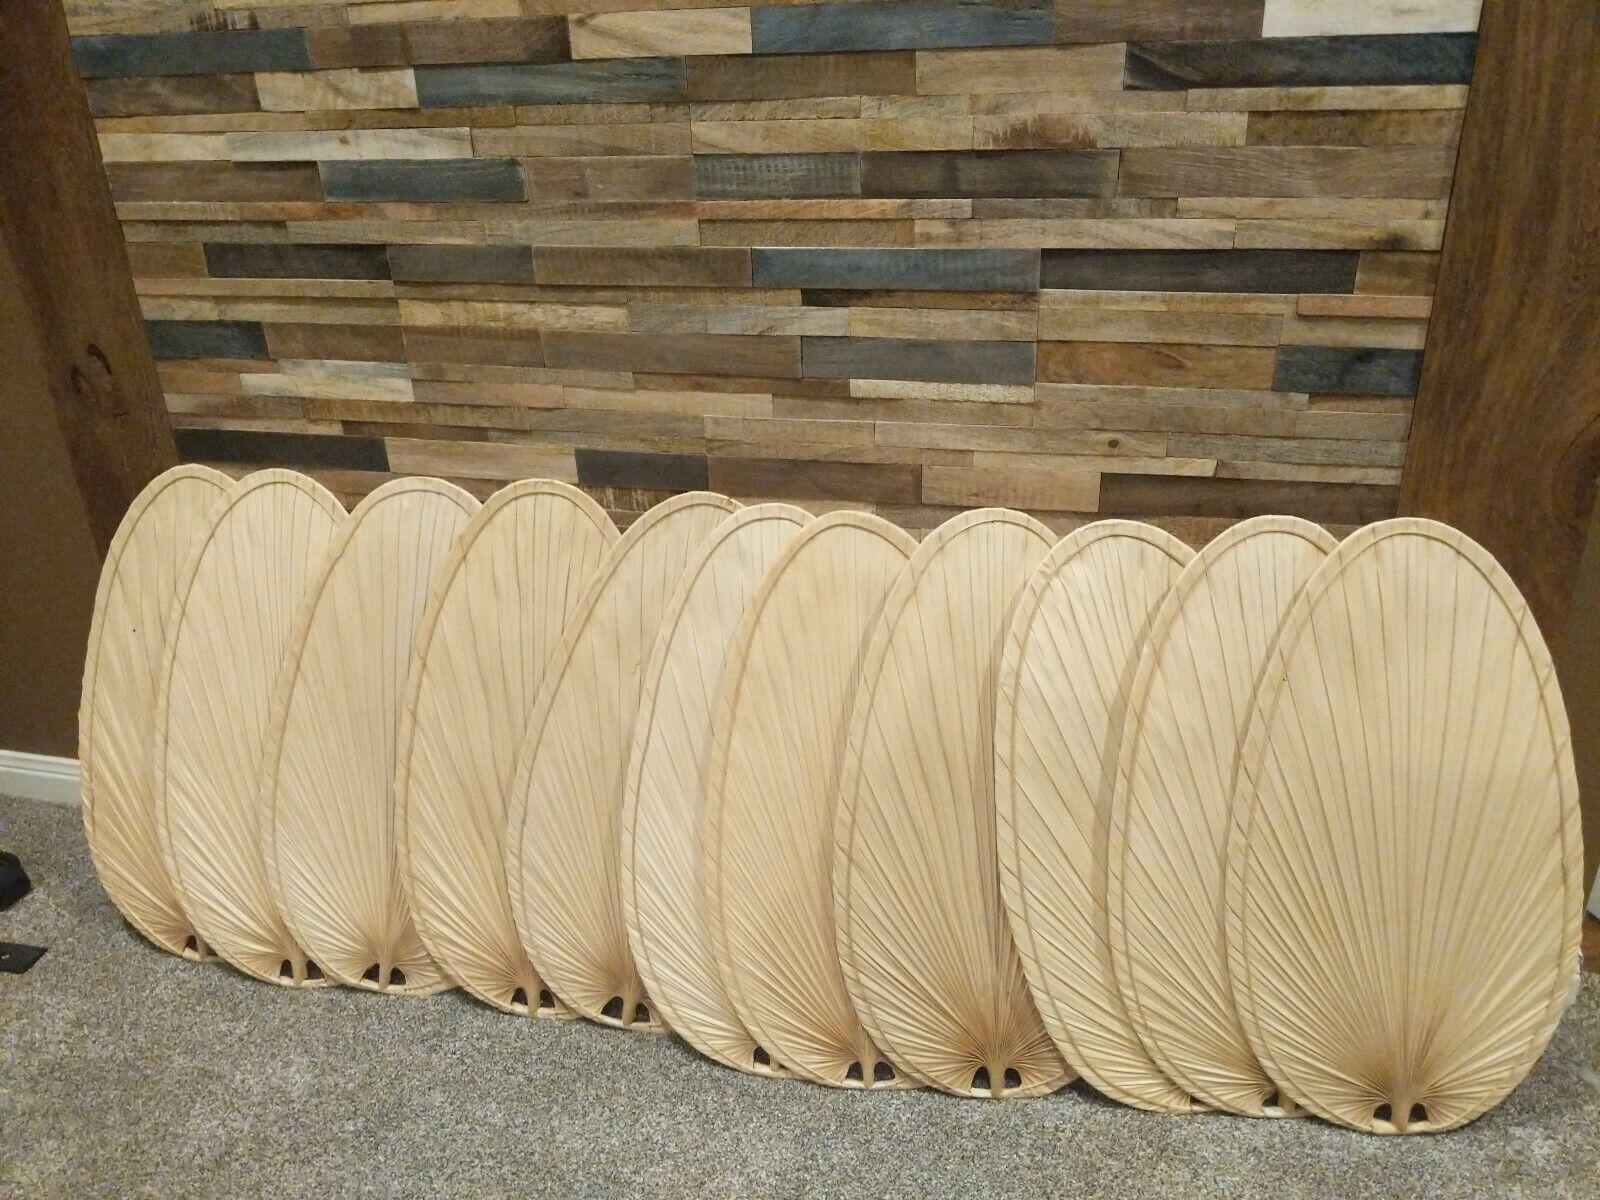 22 Narrow Oval Natural Palm Leaf Blades - Finish: Natural